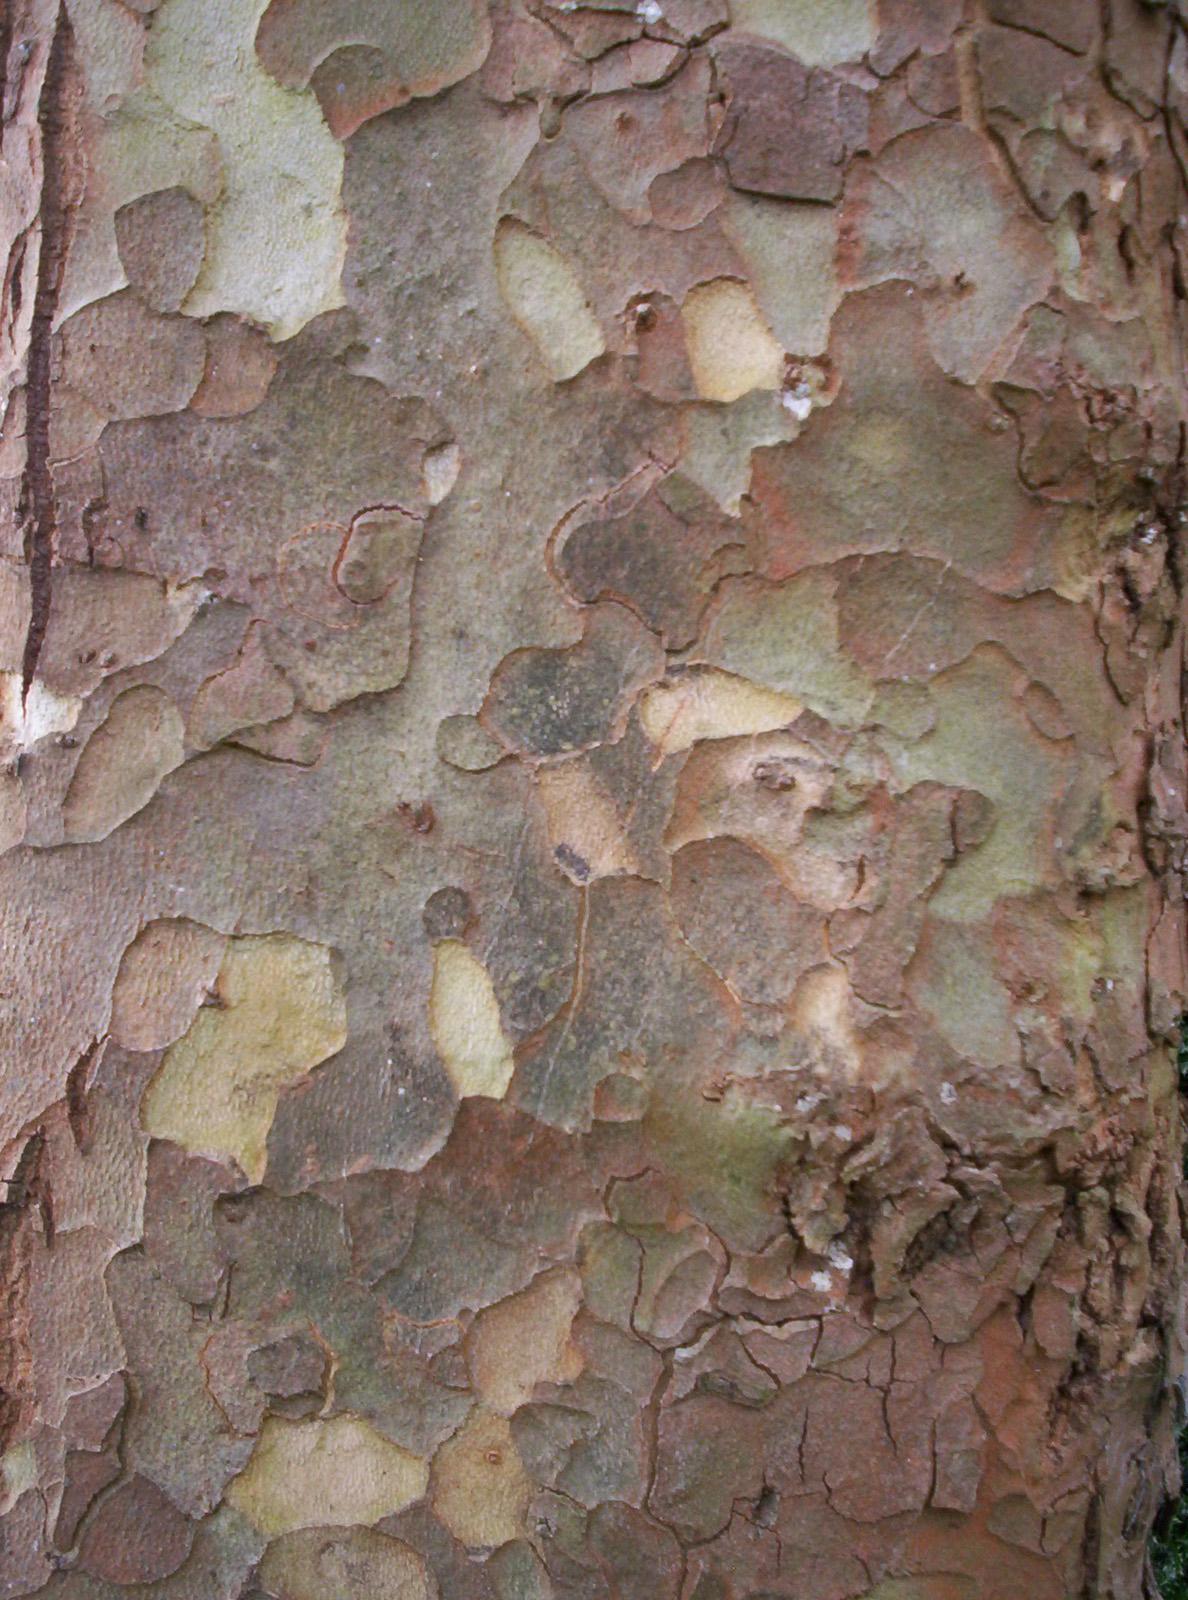 Jig Saw of Epidermal Tissue, Bark, Bspo06, Dunedin, Jigsaw, HQ Photo